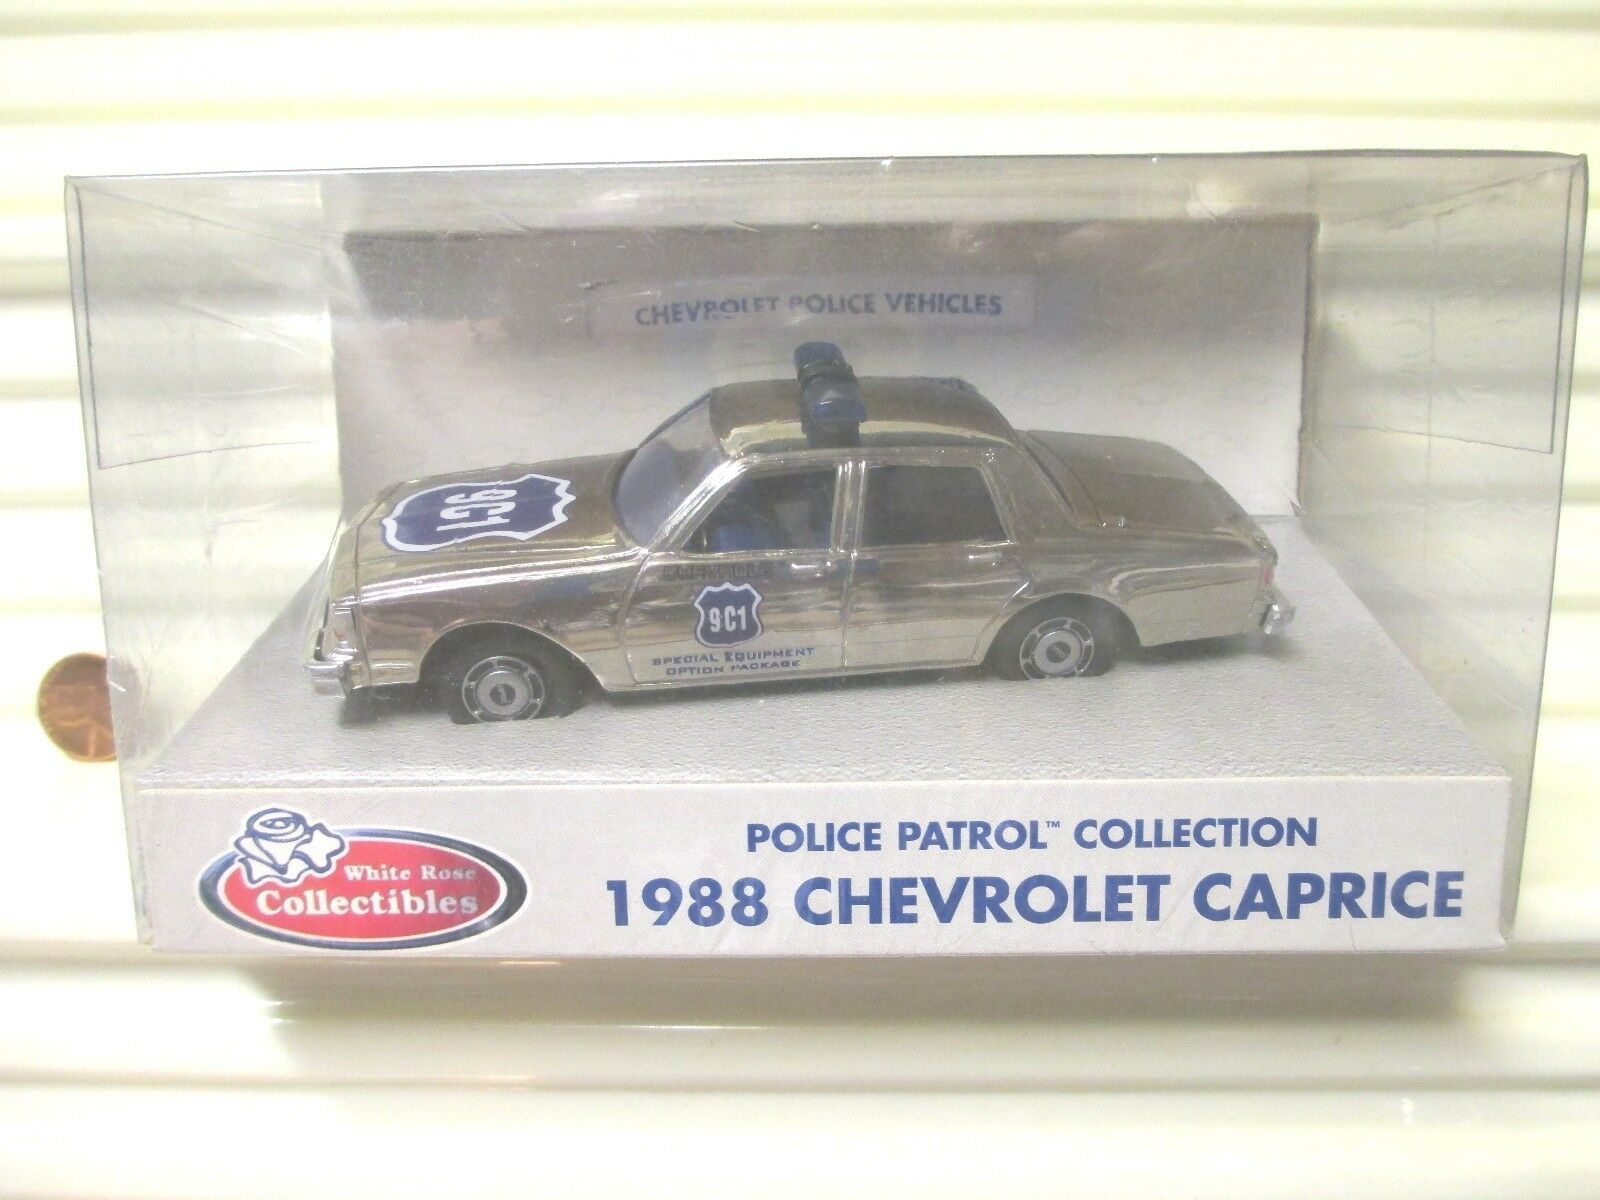 blanc Rose Collectibles  9C1 1988 POLICE PATROL Chrome Chevrolet CAPRICE nuboxed  acheter pas cher neuf